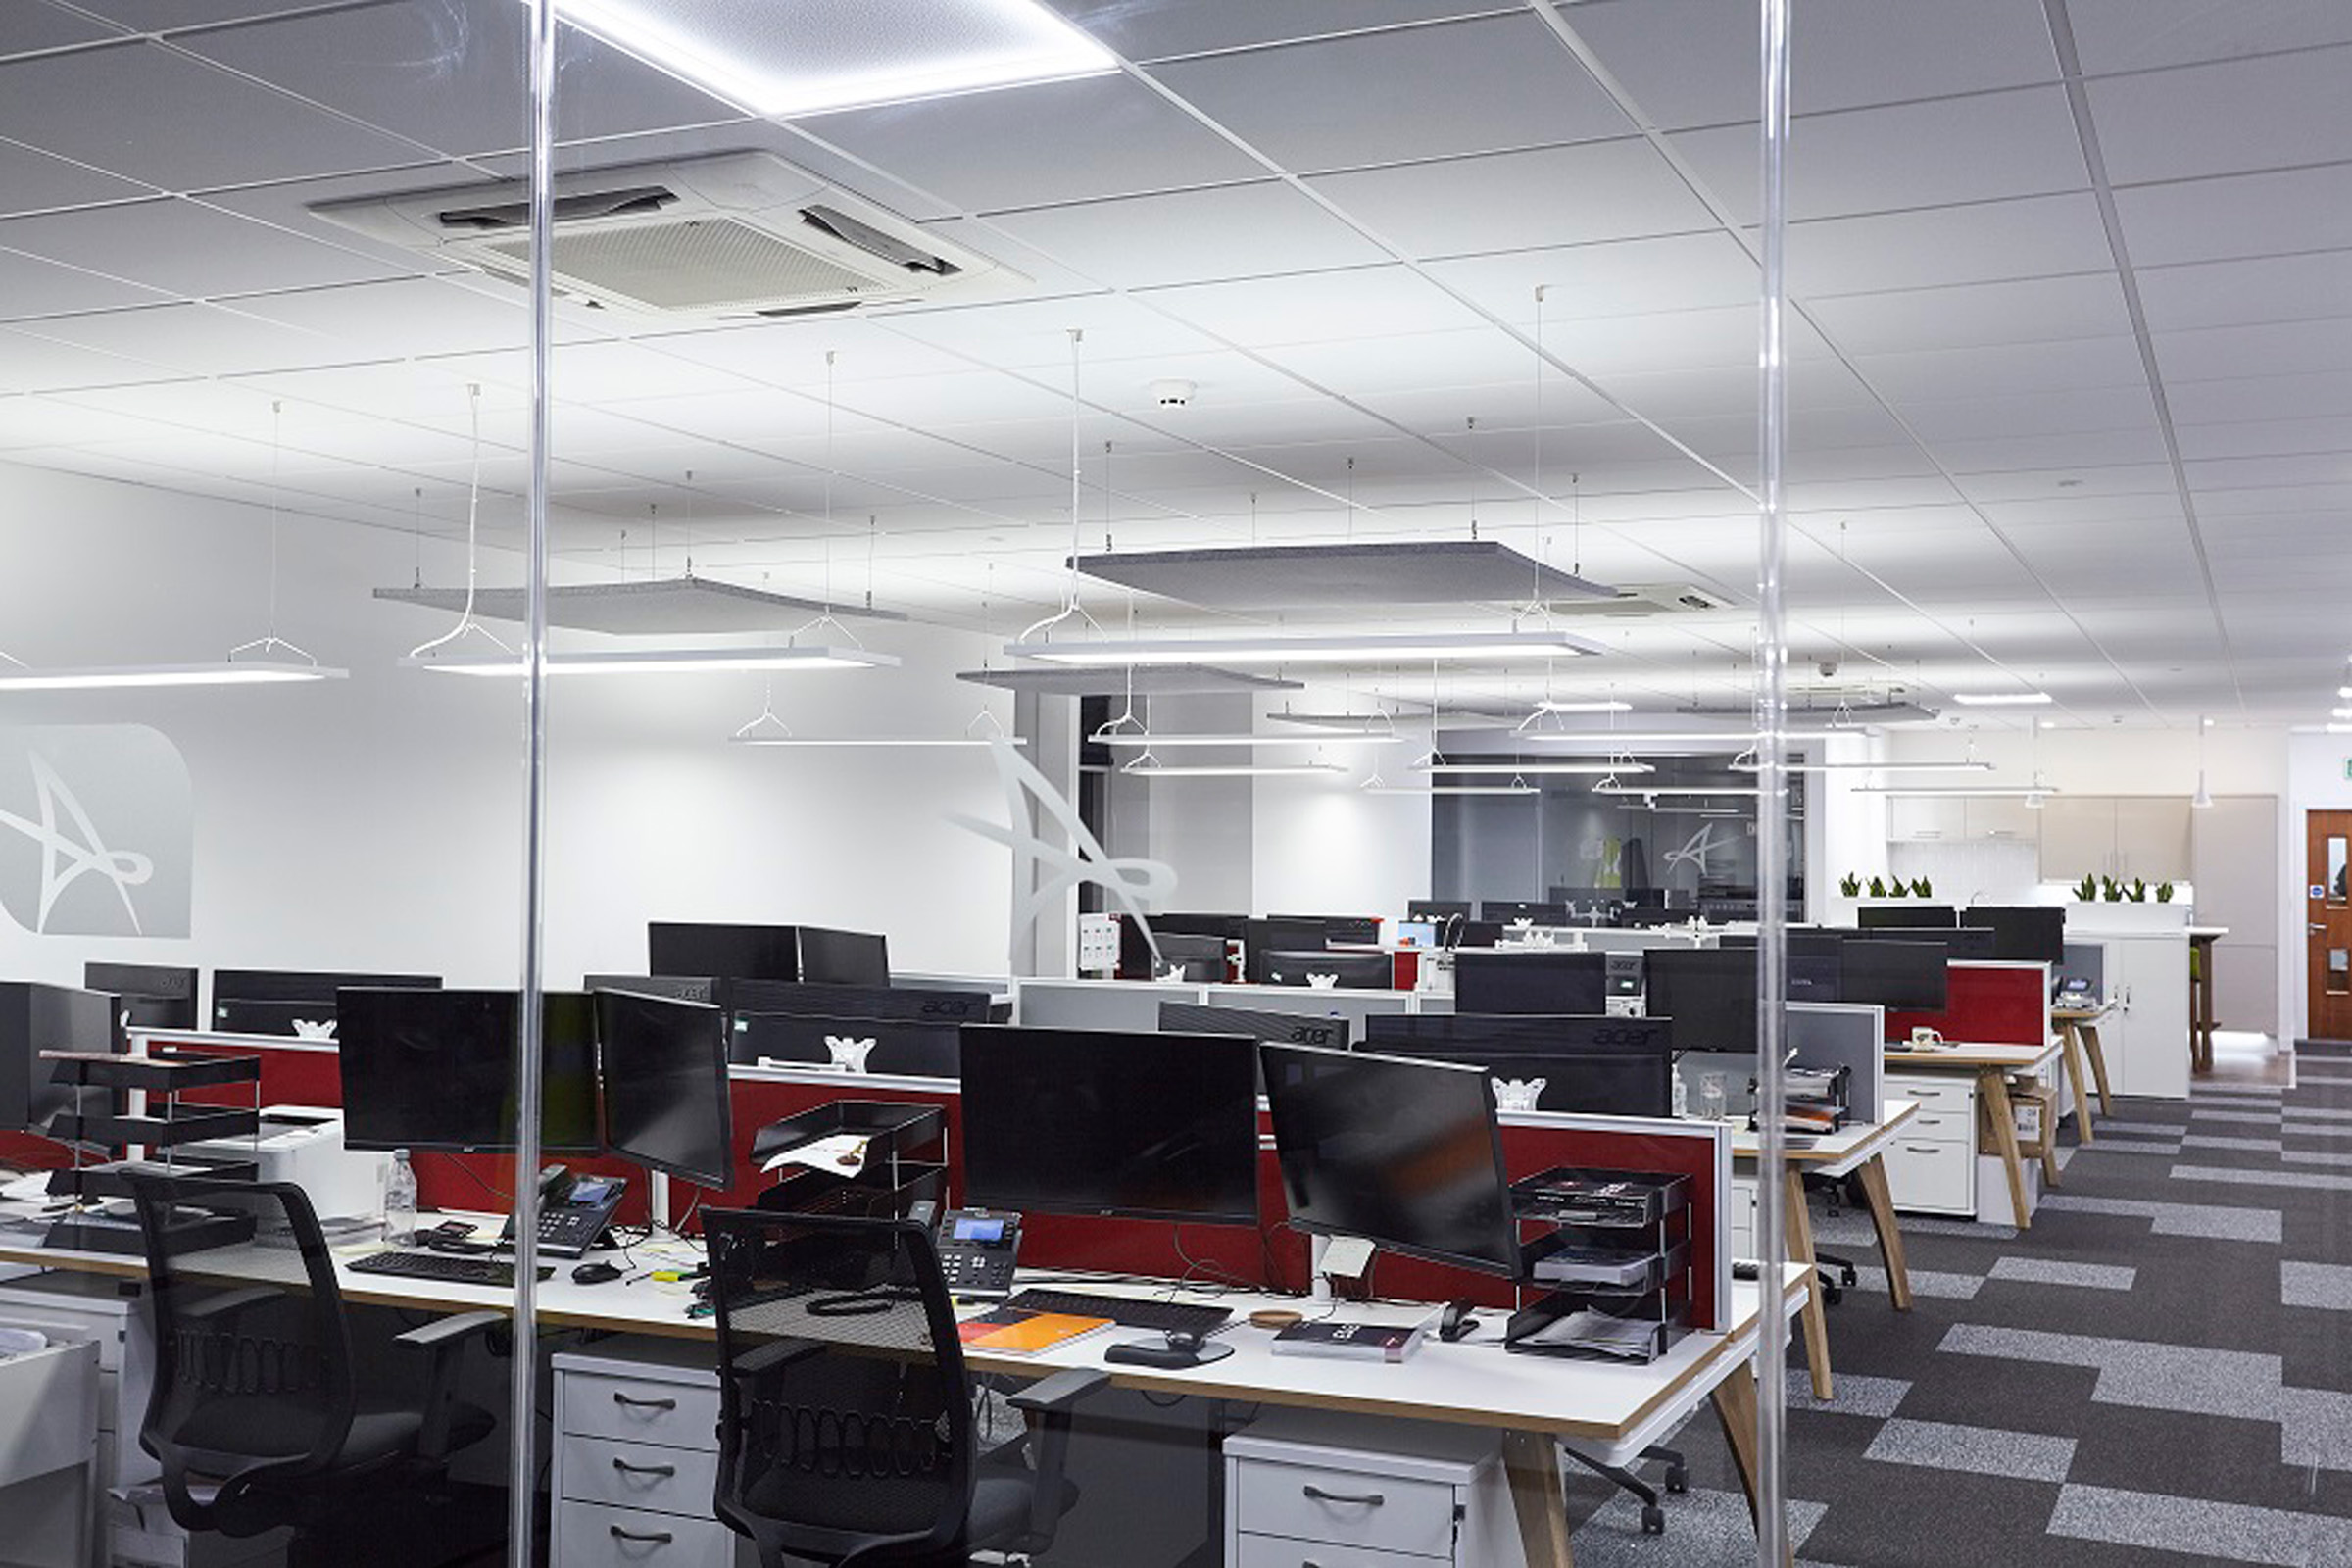 Efficient workspace with smart lighting